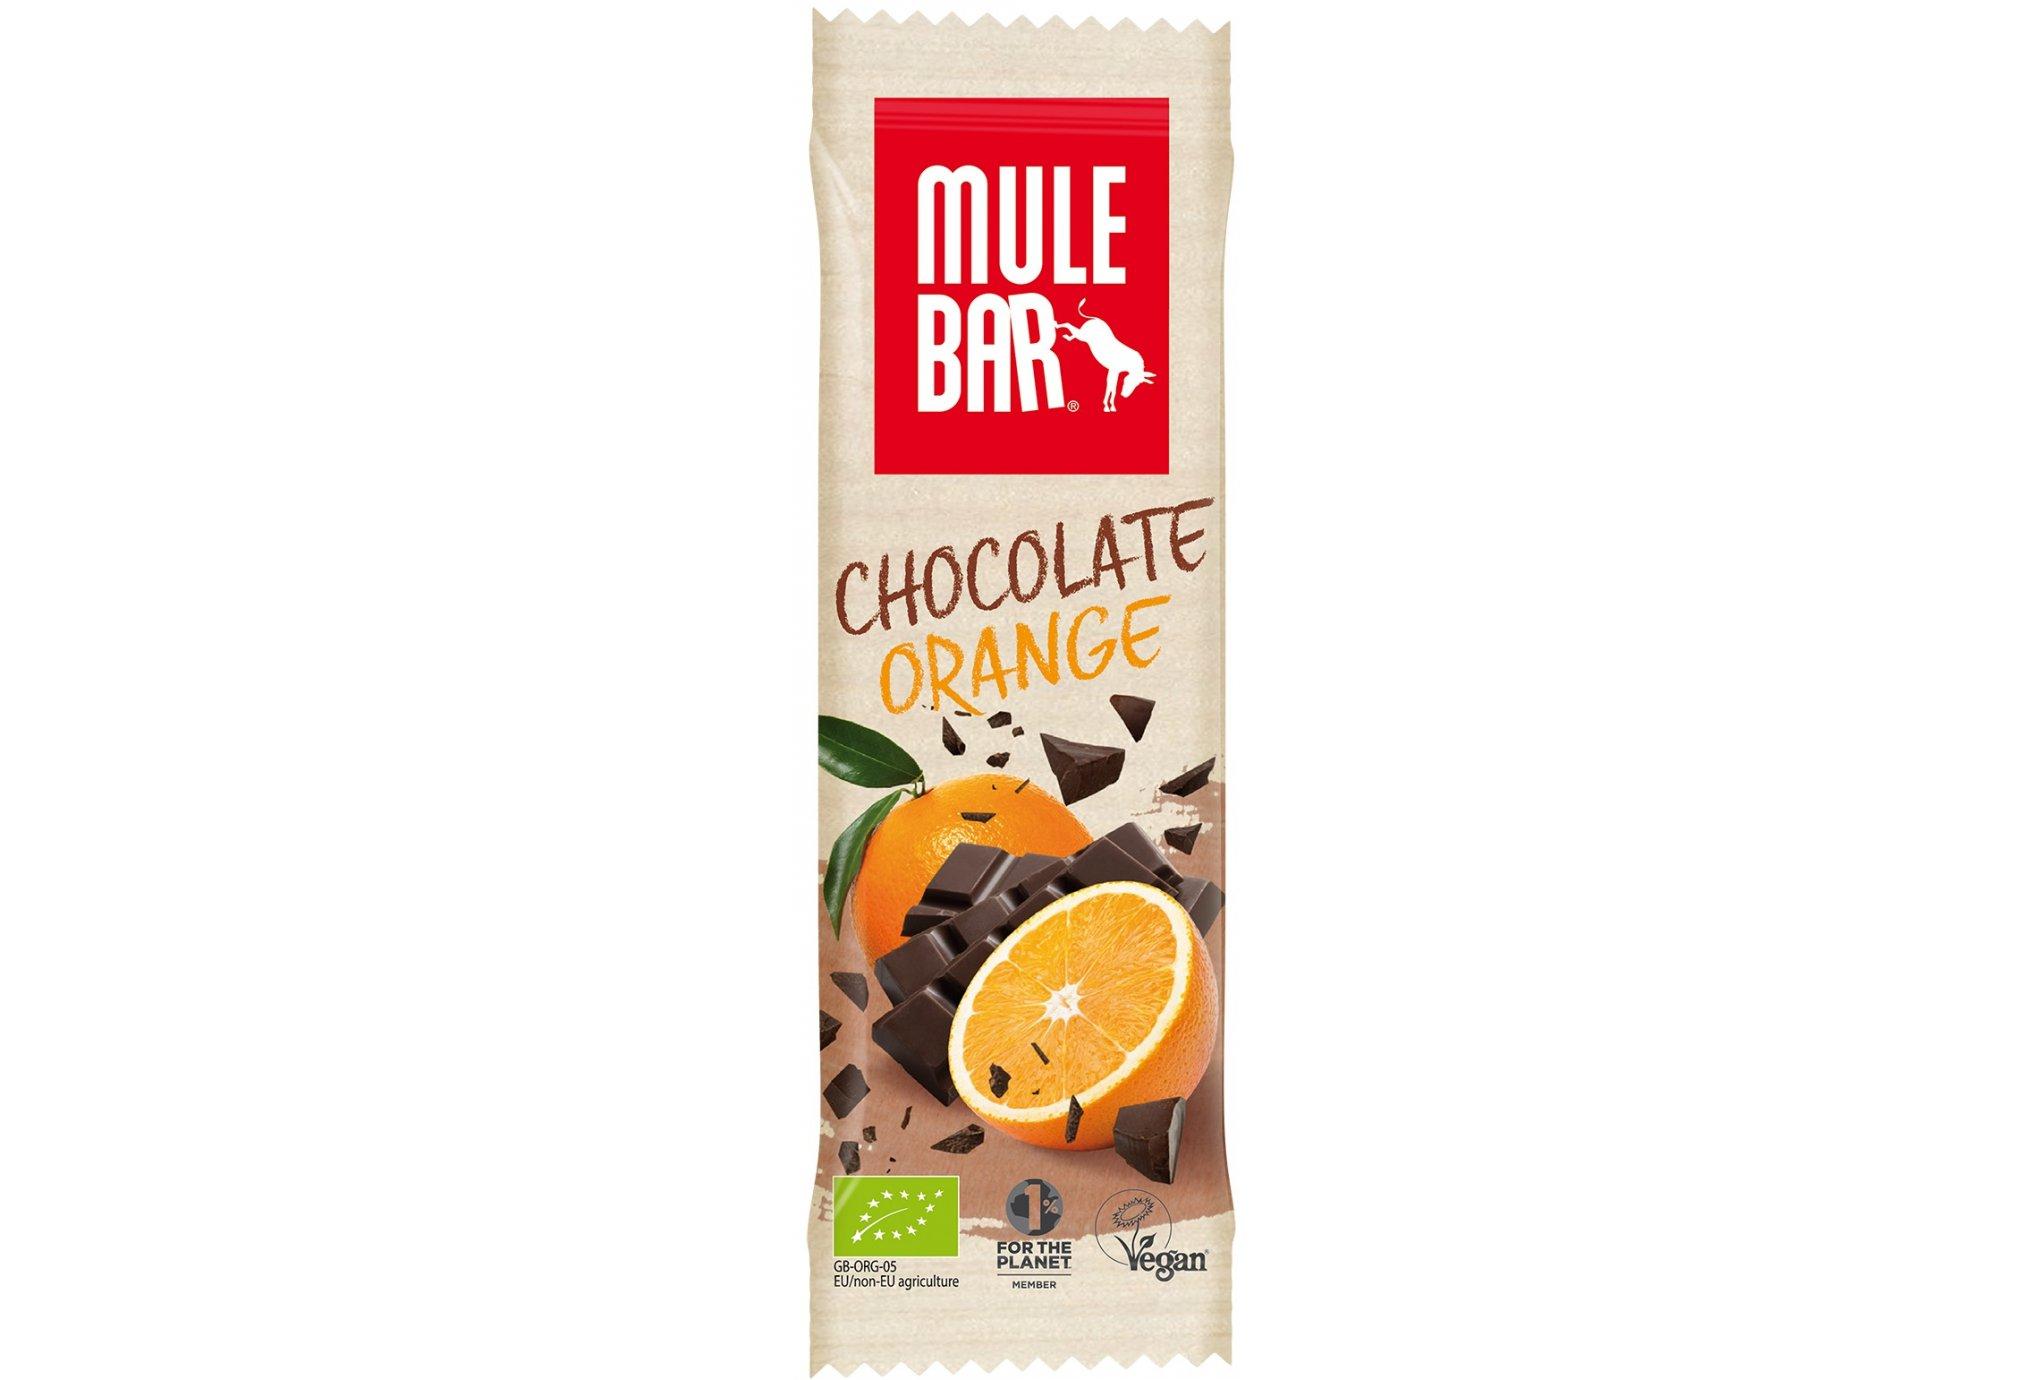 Mulebar Barra energética Jimmy's - Chocolate/Naranja Diététique Barres